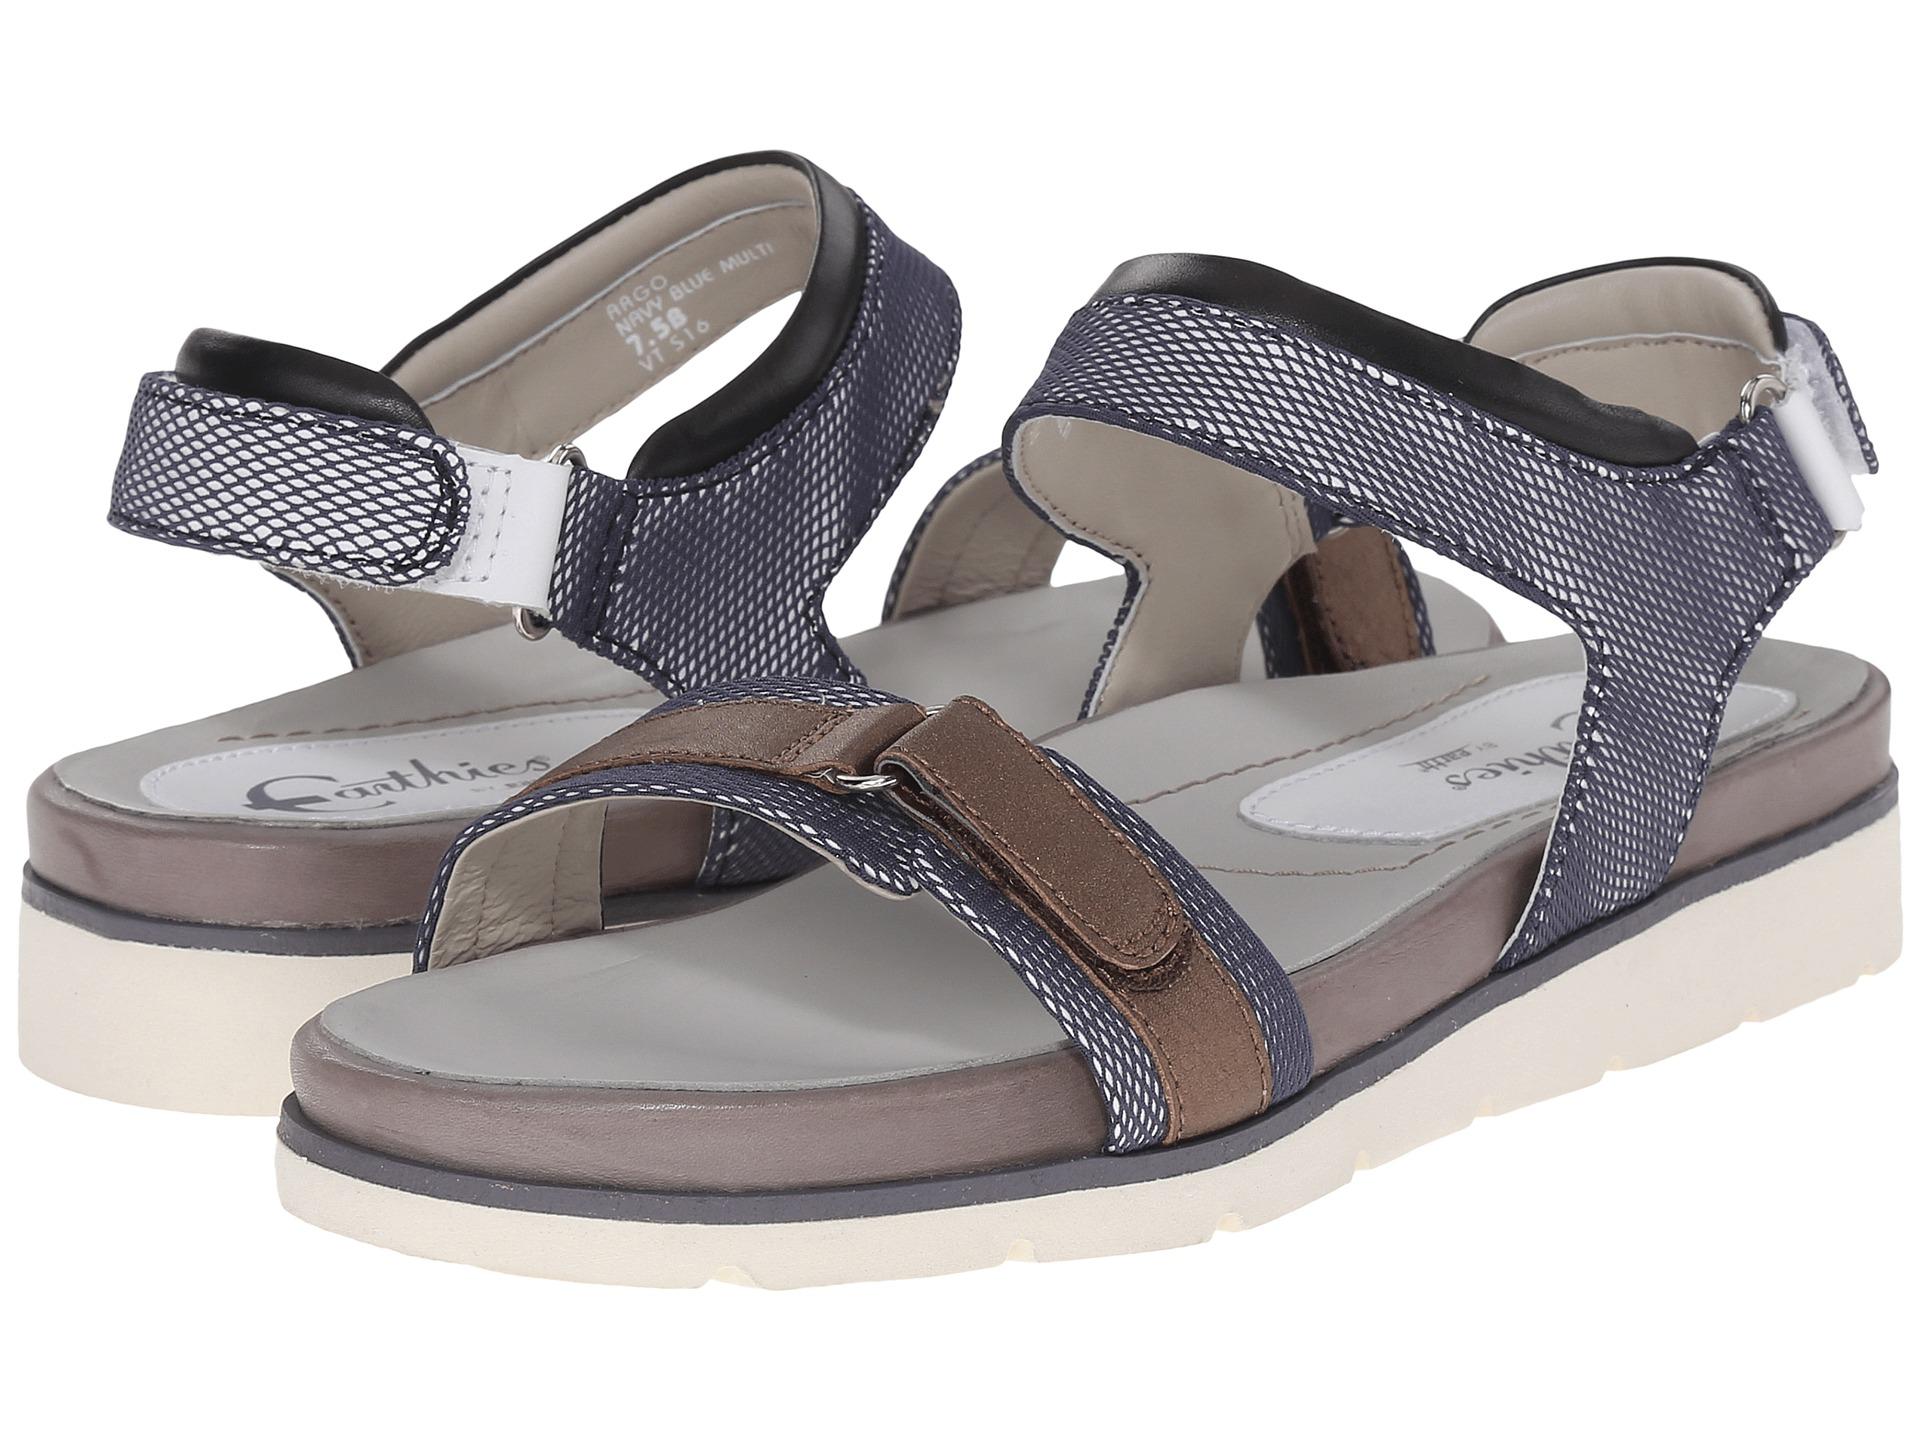 Black earth sandals - Black Earth Sandals 39